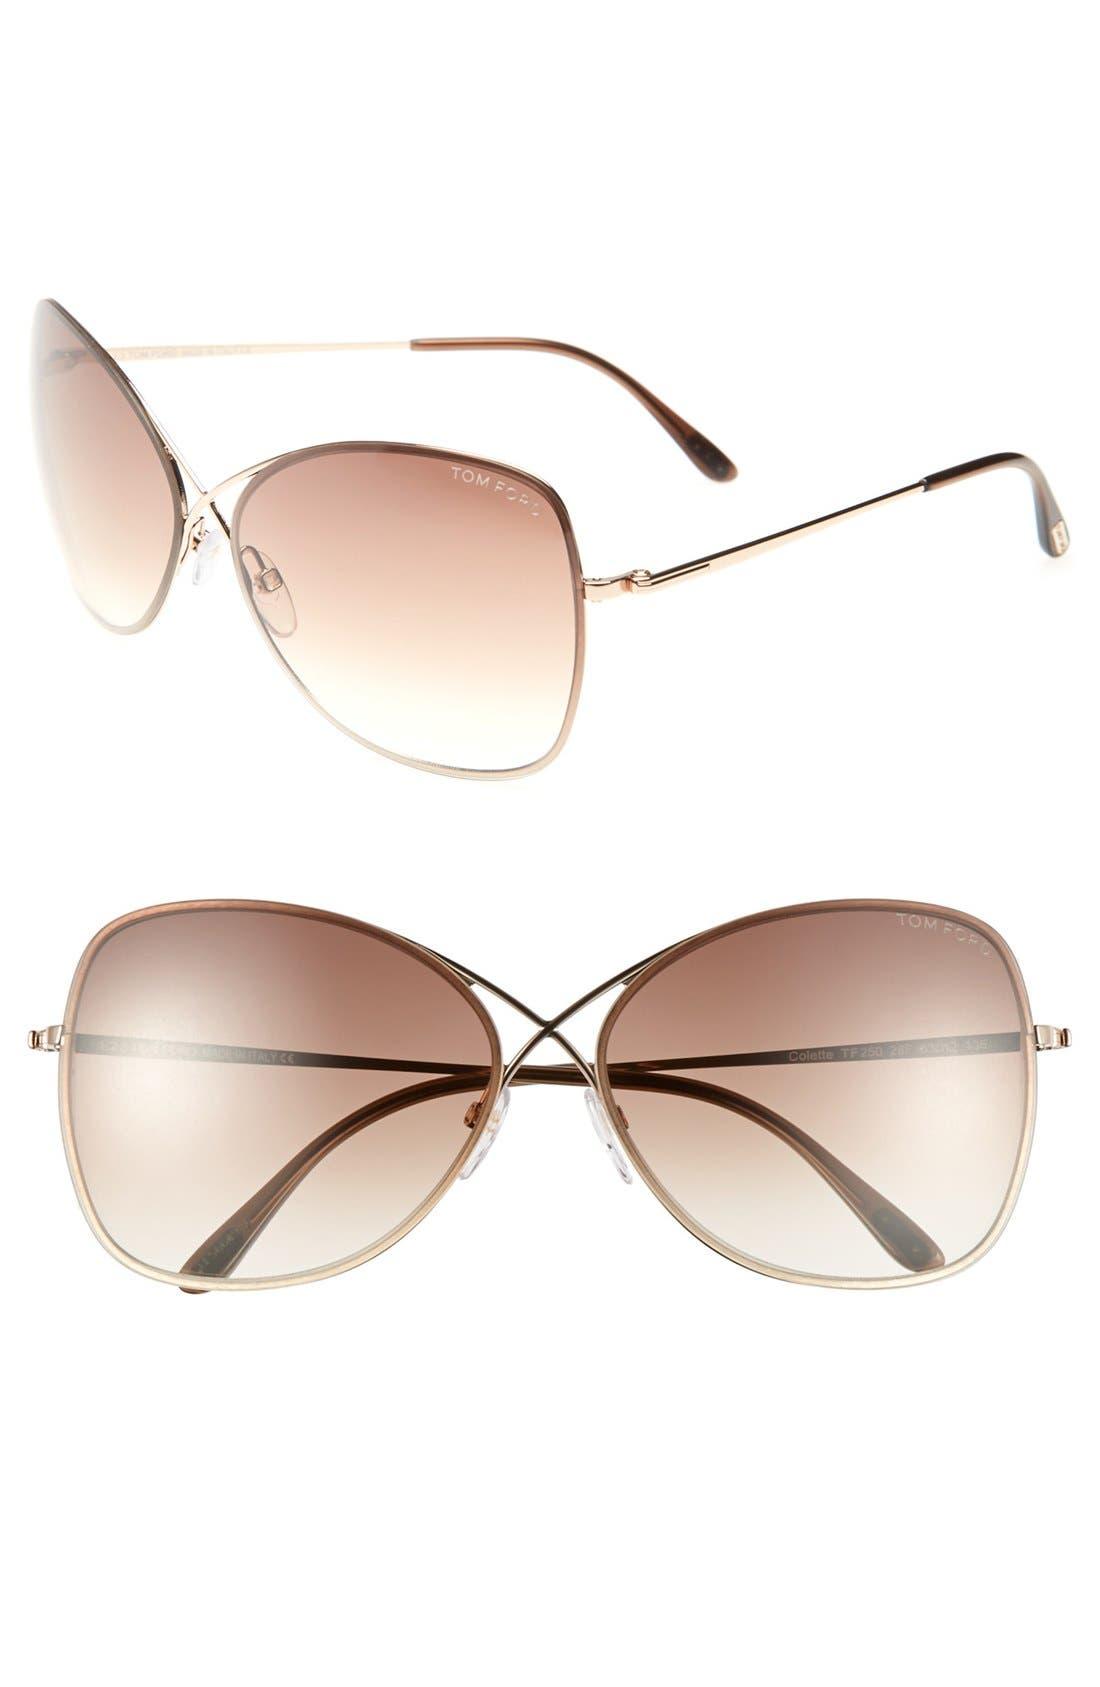 Alternate Image 1 Selected - Tom Ford 'Colette' 63mm Oversize Sunglasses